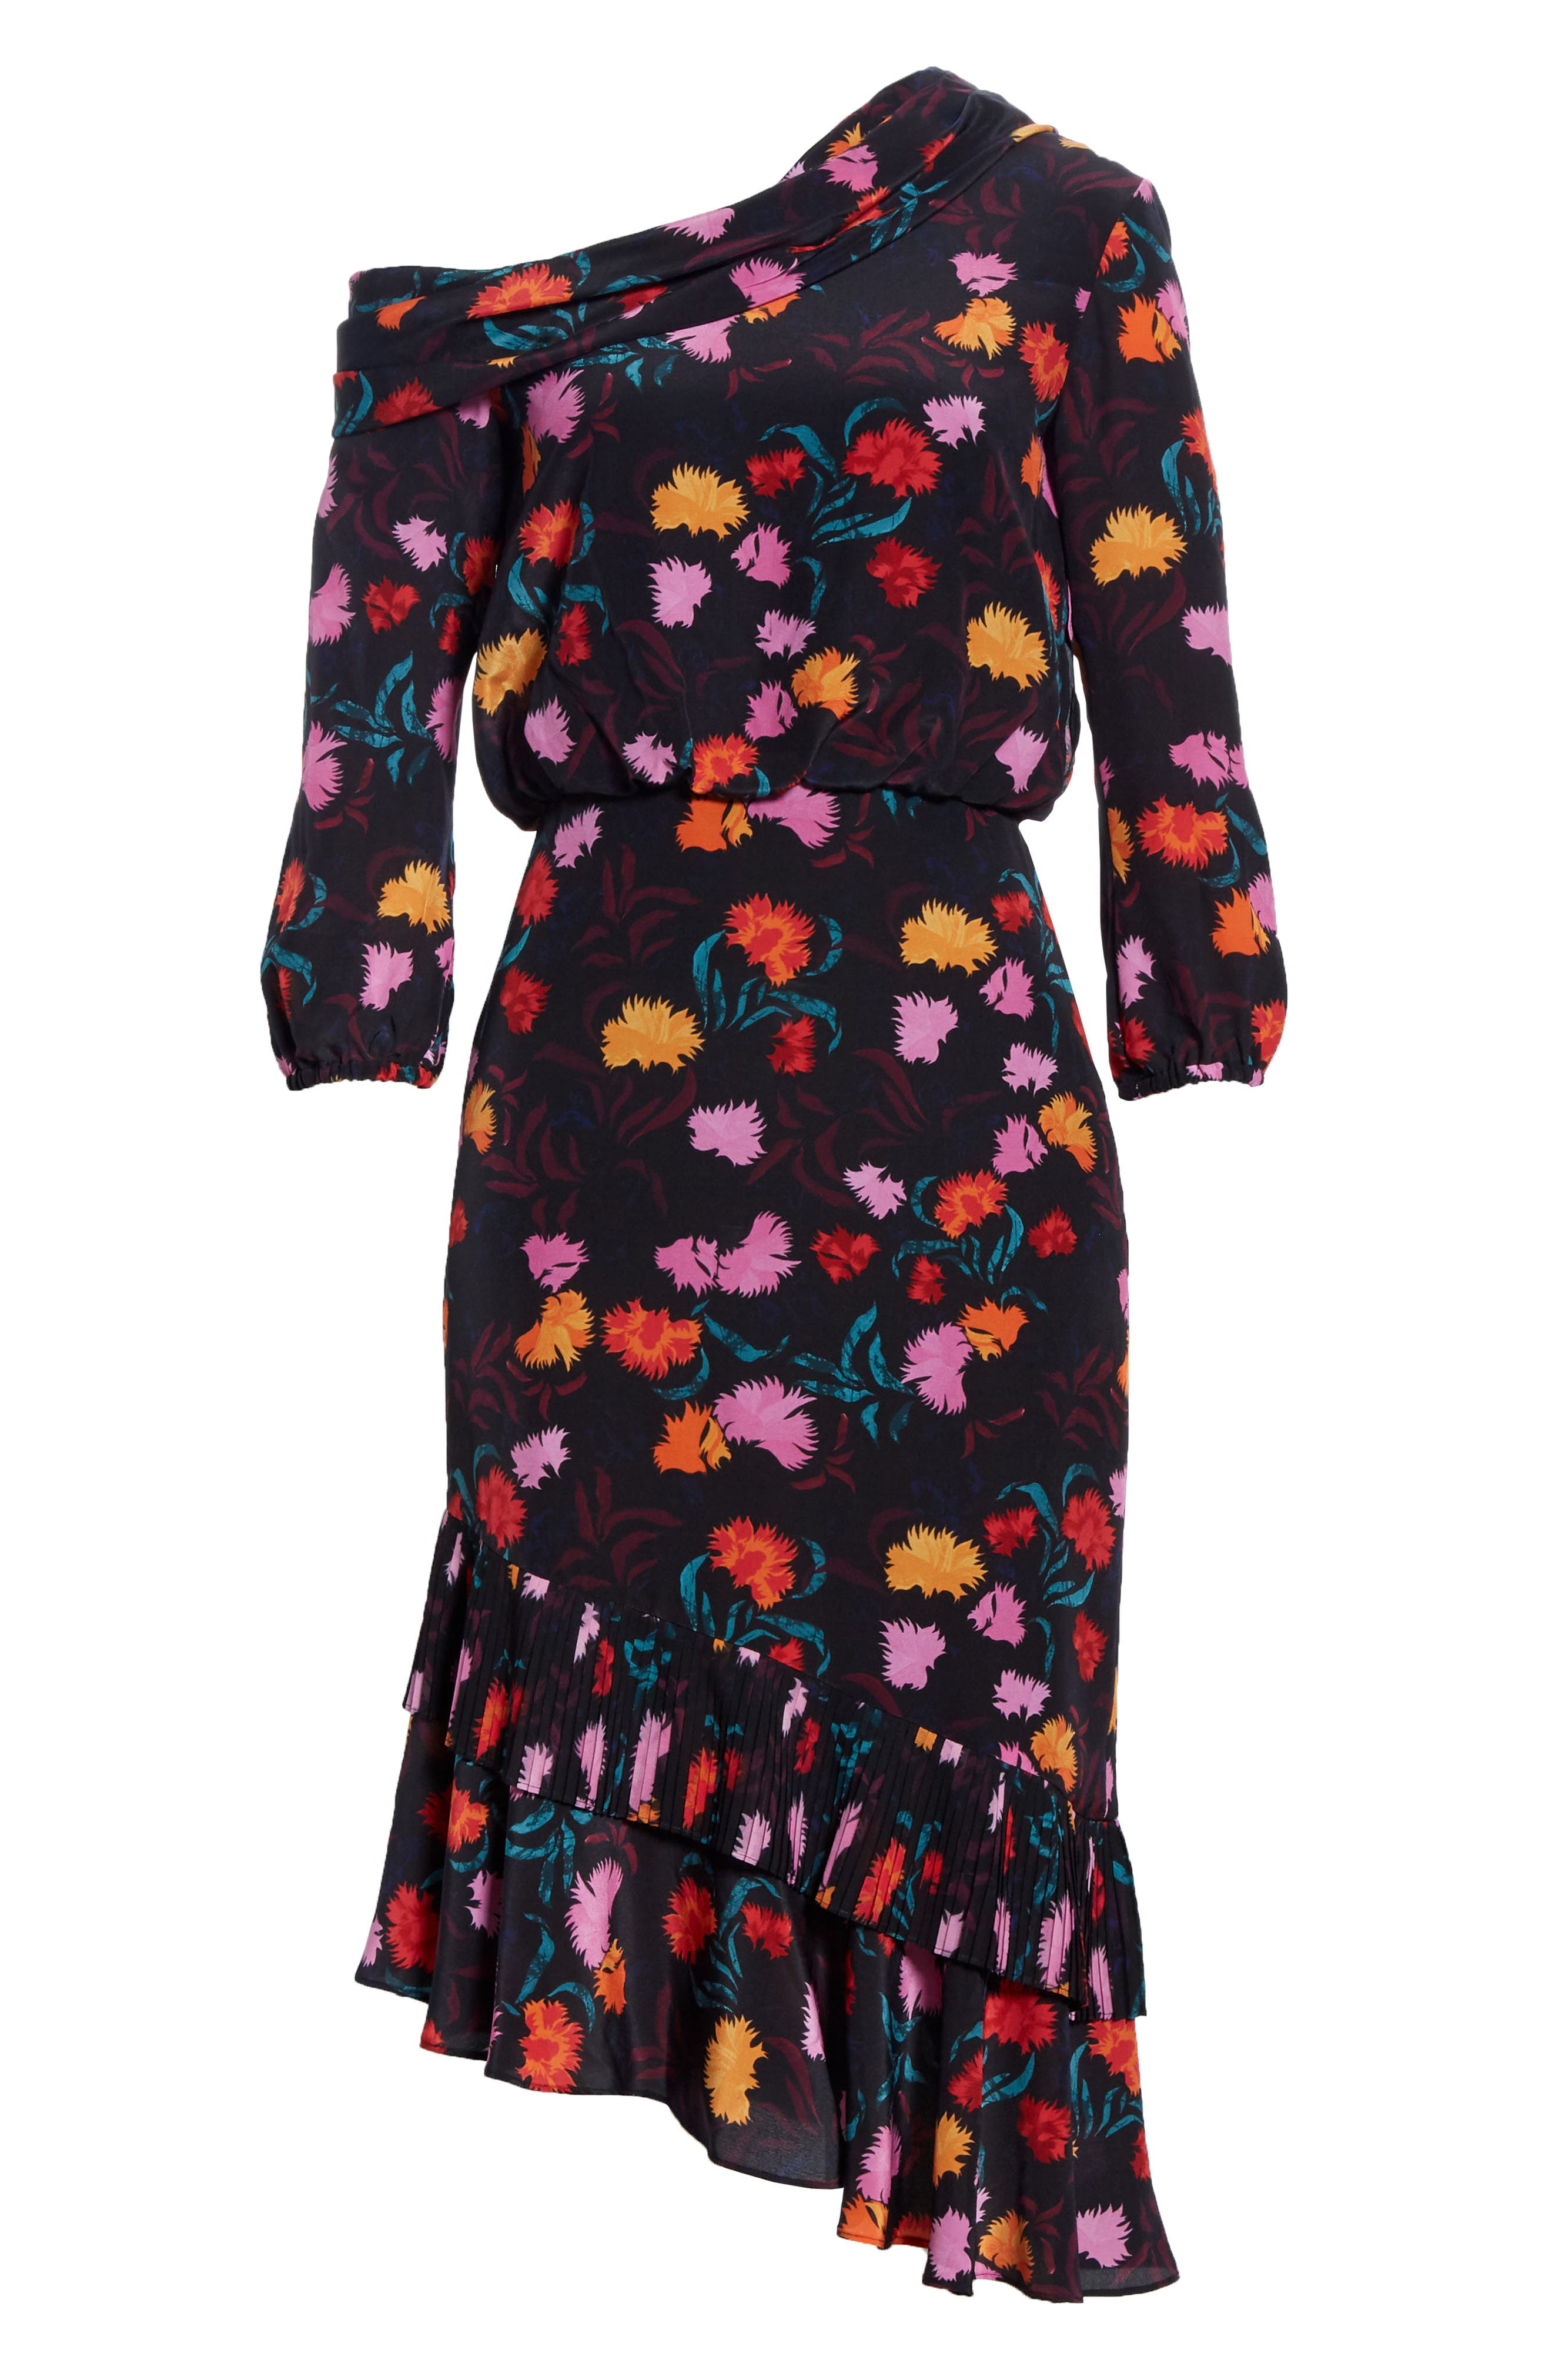 Lexie Floral Print Silk Off the Shoulder Dress,                             Alternate thumbnail 6, color,                             BLACK AZALEA